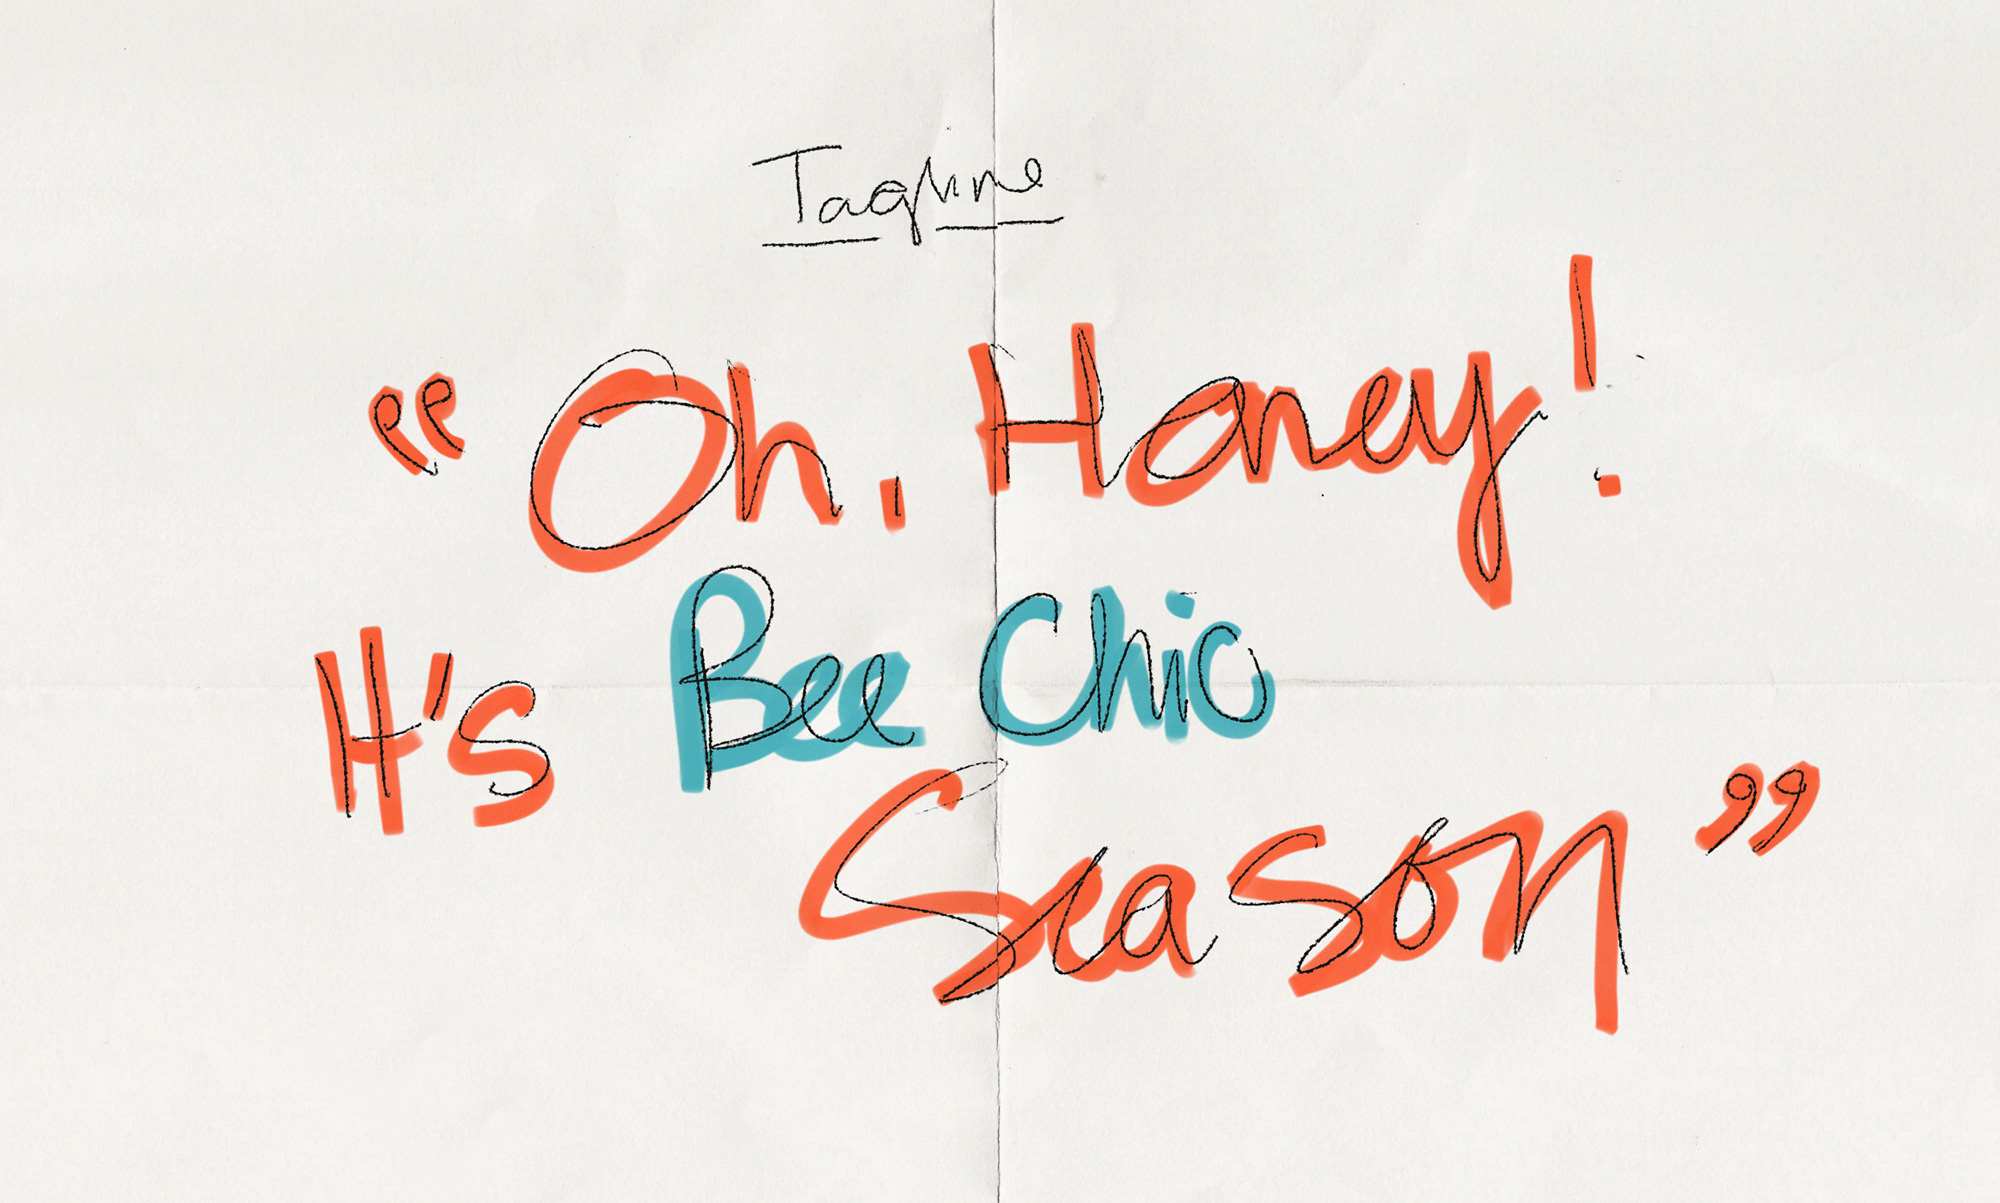 The tagline for the campaign